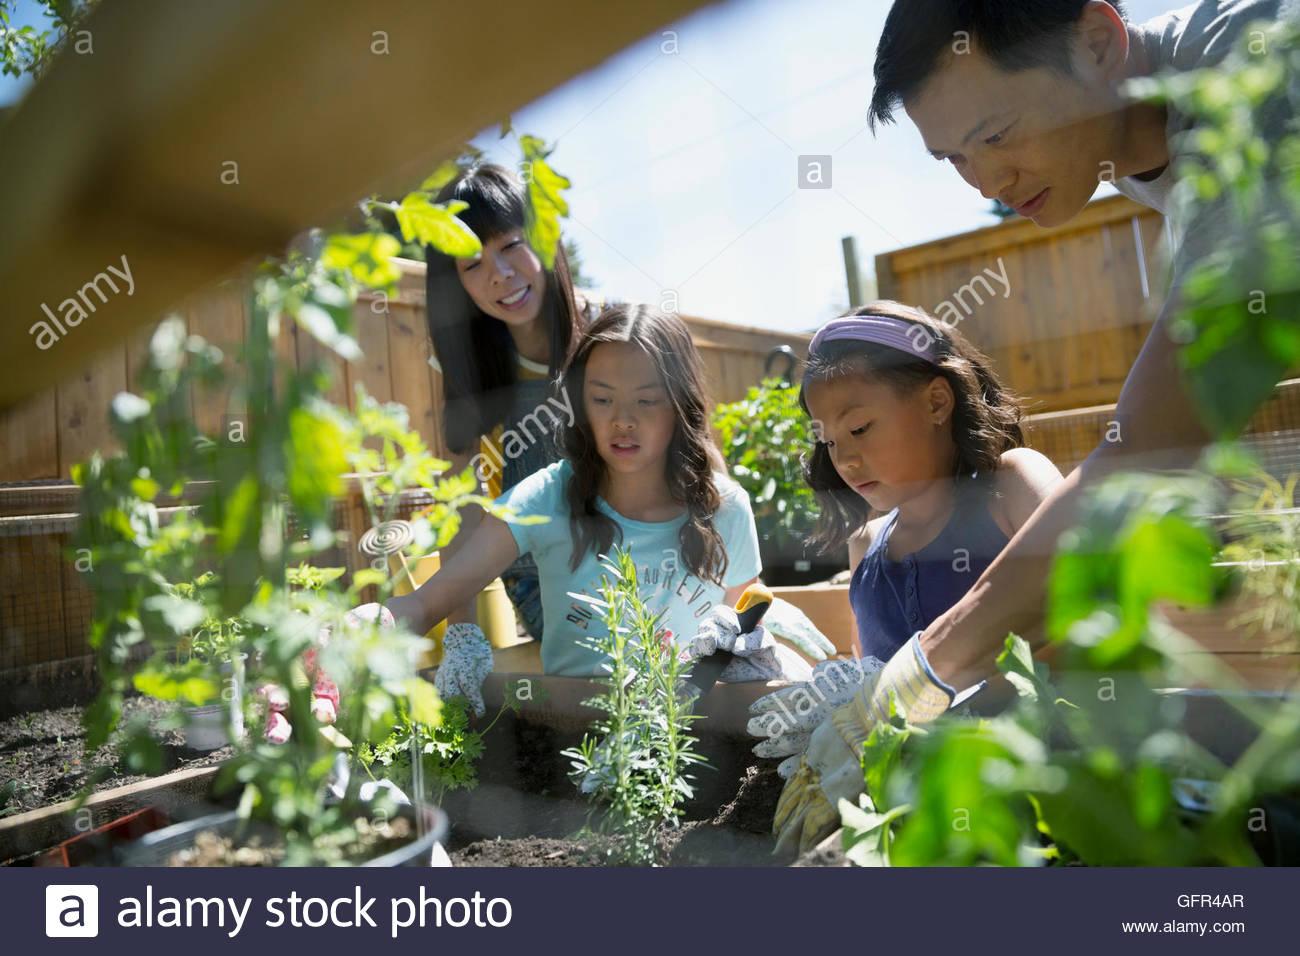 Family planting herbs in sunny garden - Stock Image